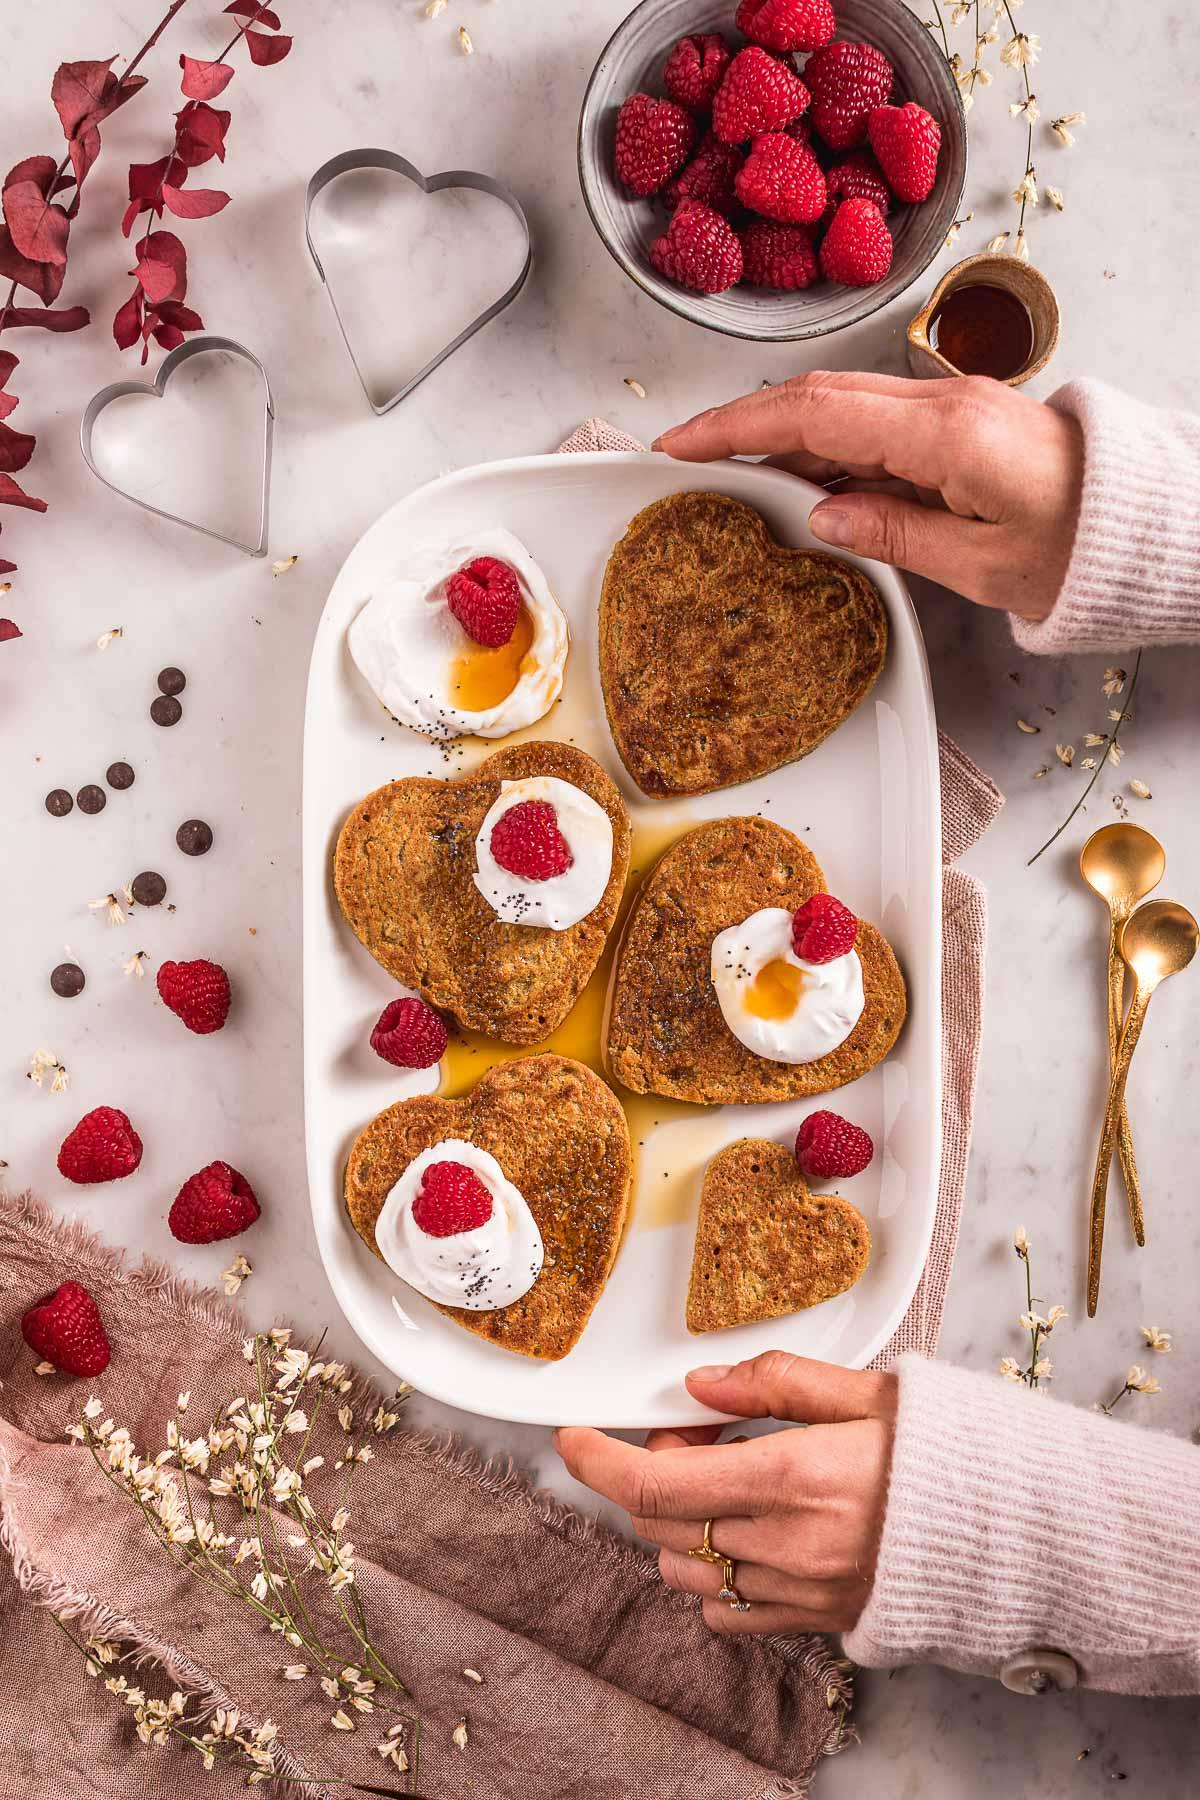 ricetta Pancakes di San Valentino pancakes vegan senza glutine senza uova senza frutta secca Easy gluten-free vegan oat pancakes nut-free recipe